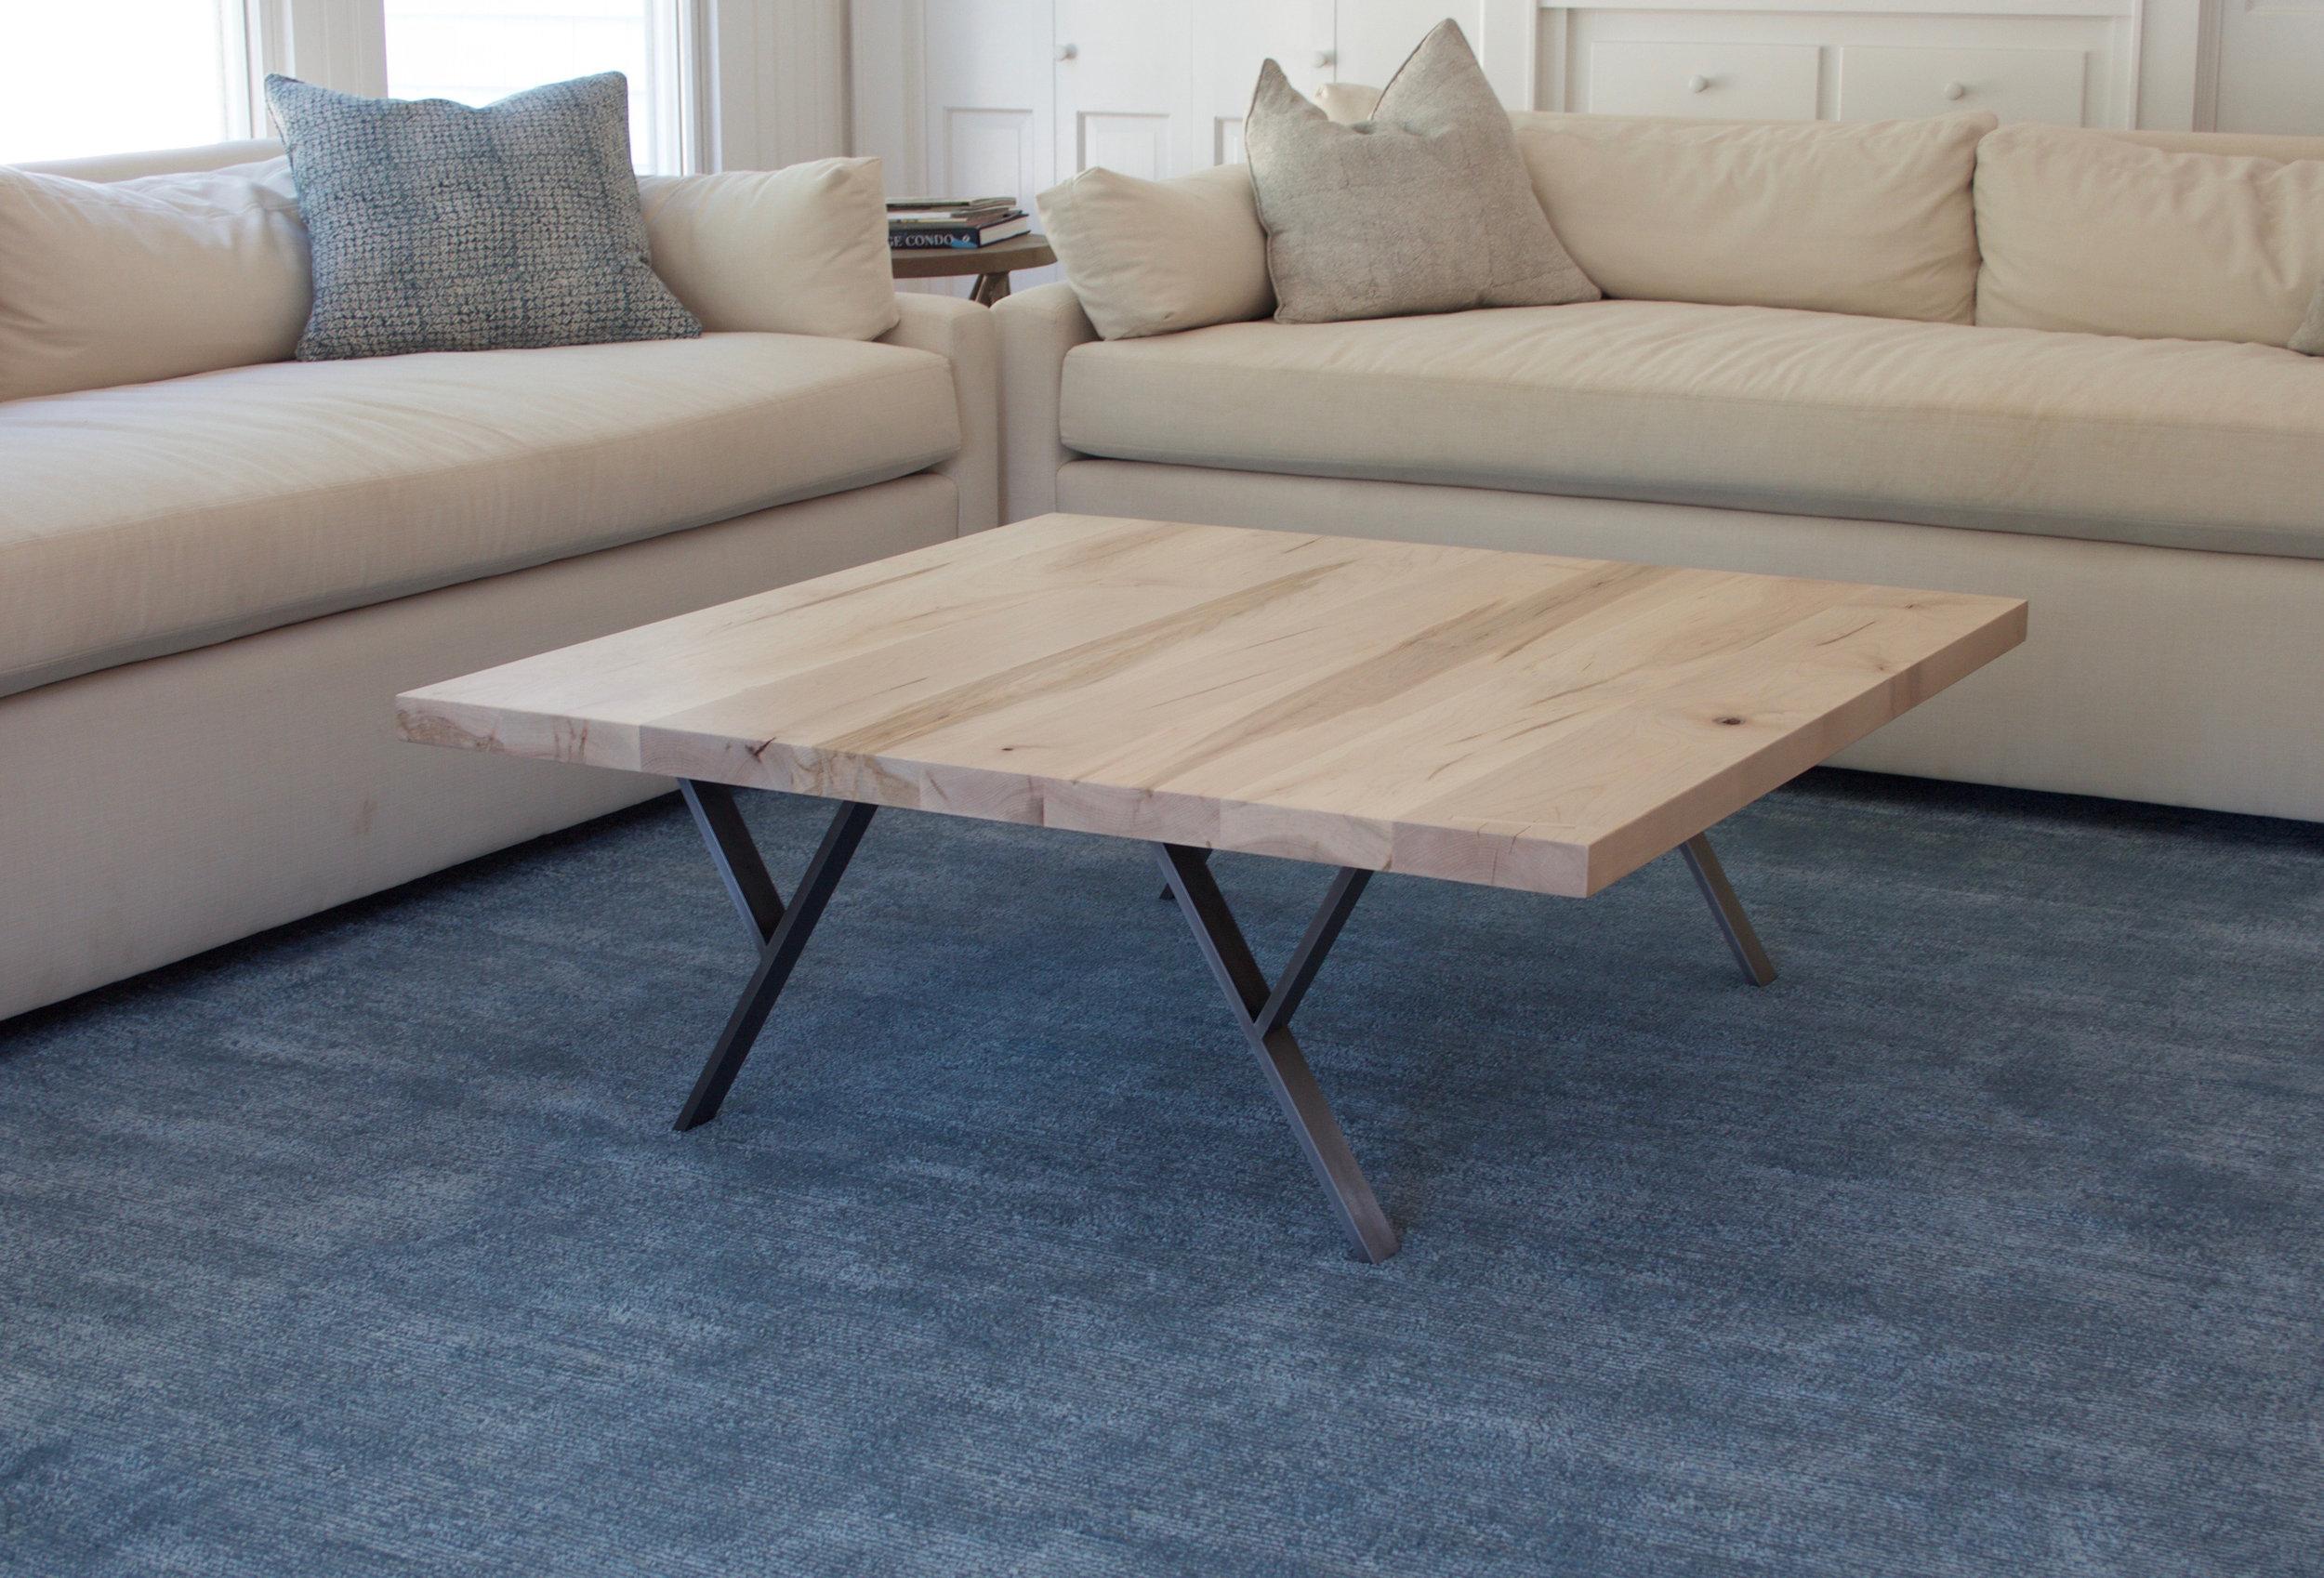 Ambrosia-maple-coffee-table-1.2.jpg